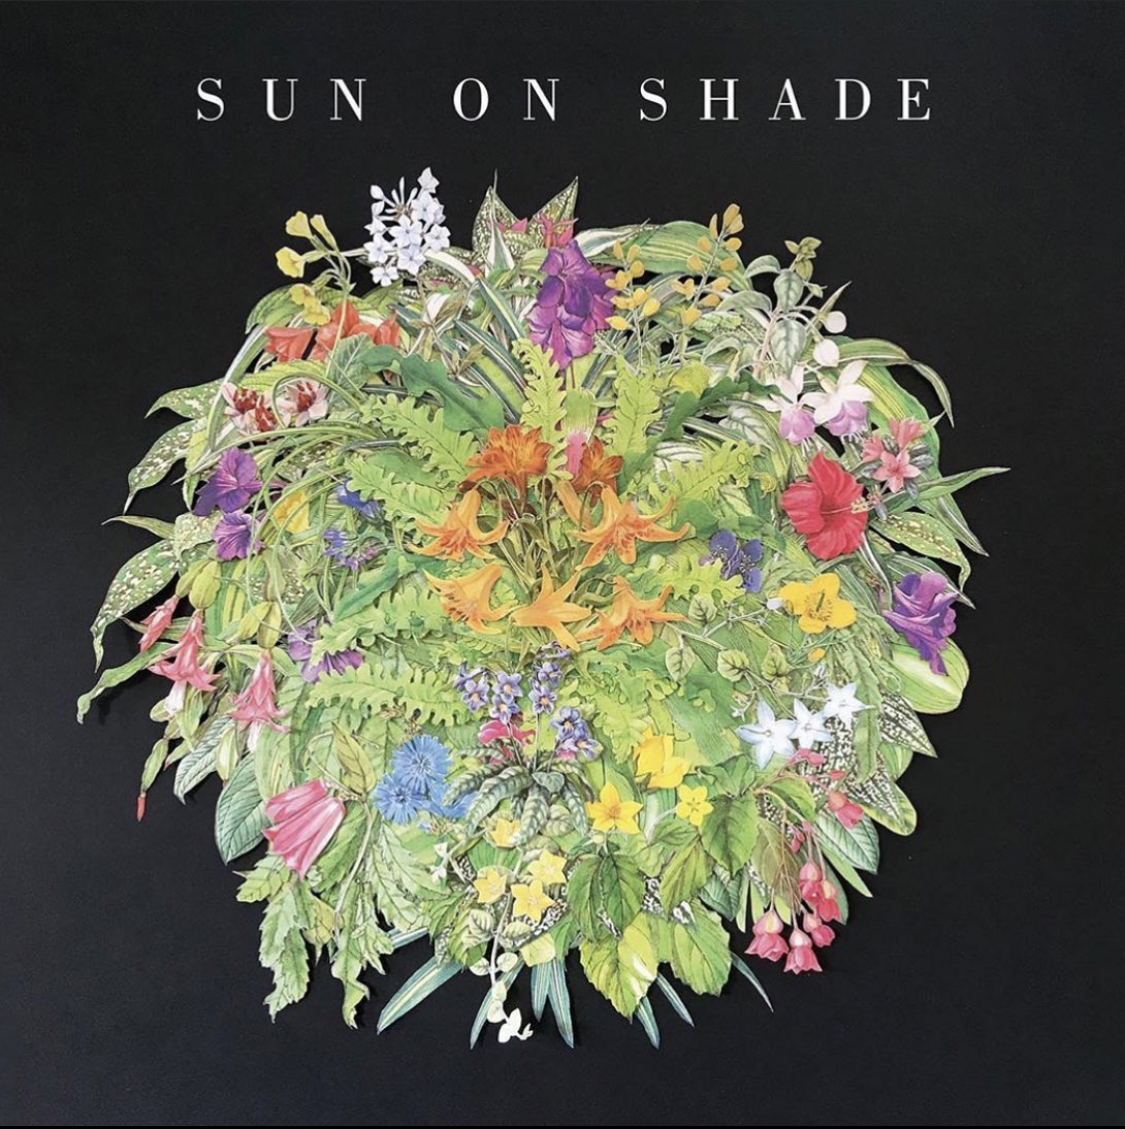 Sun on Shade, 360 Magazine